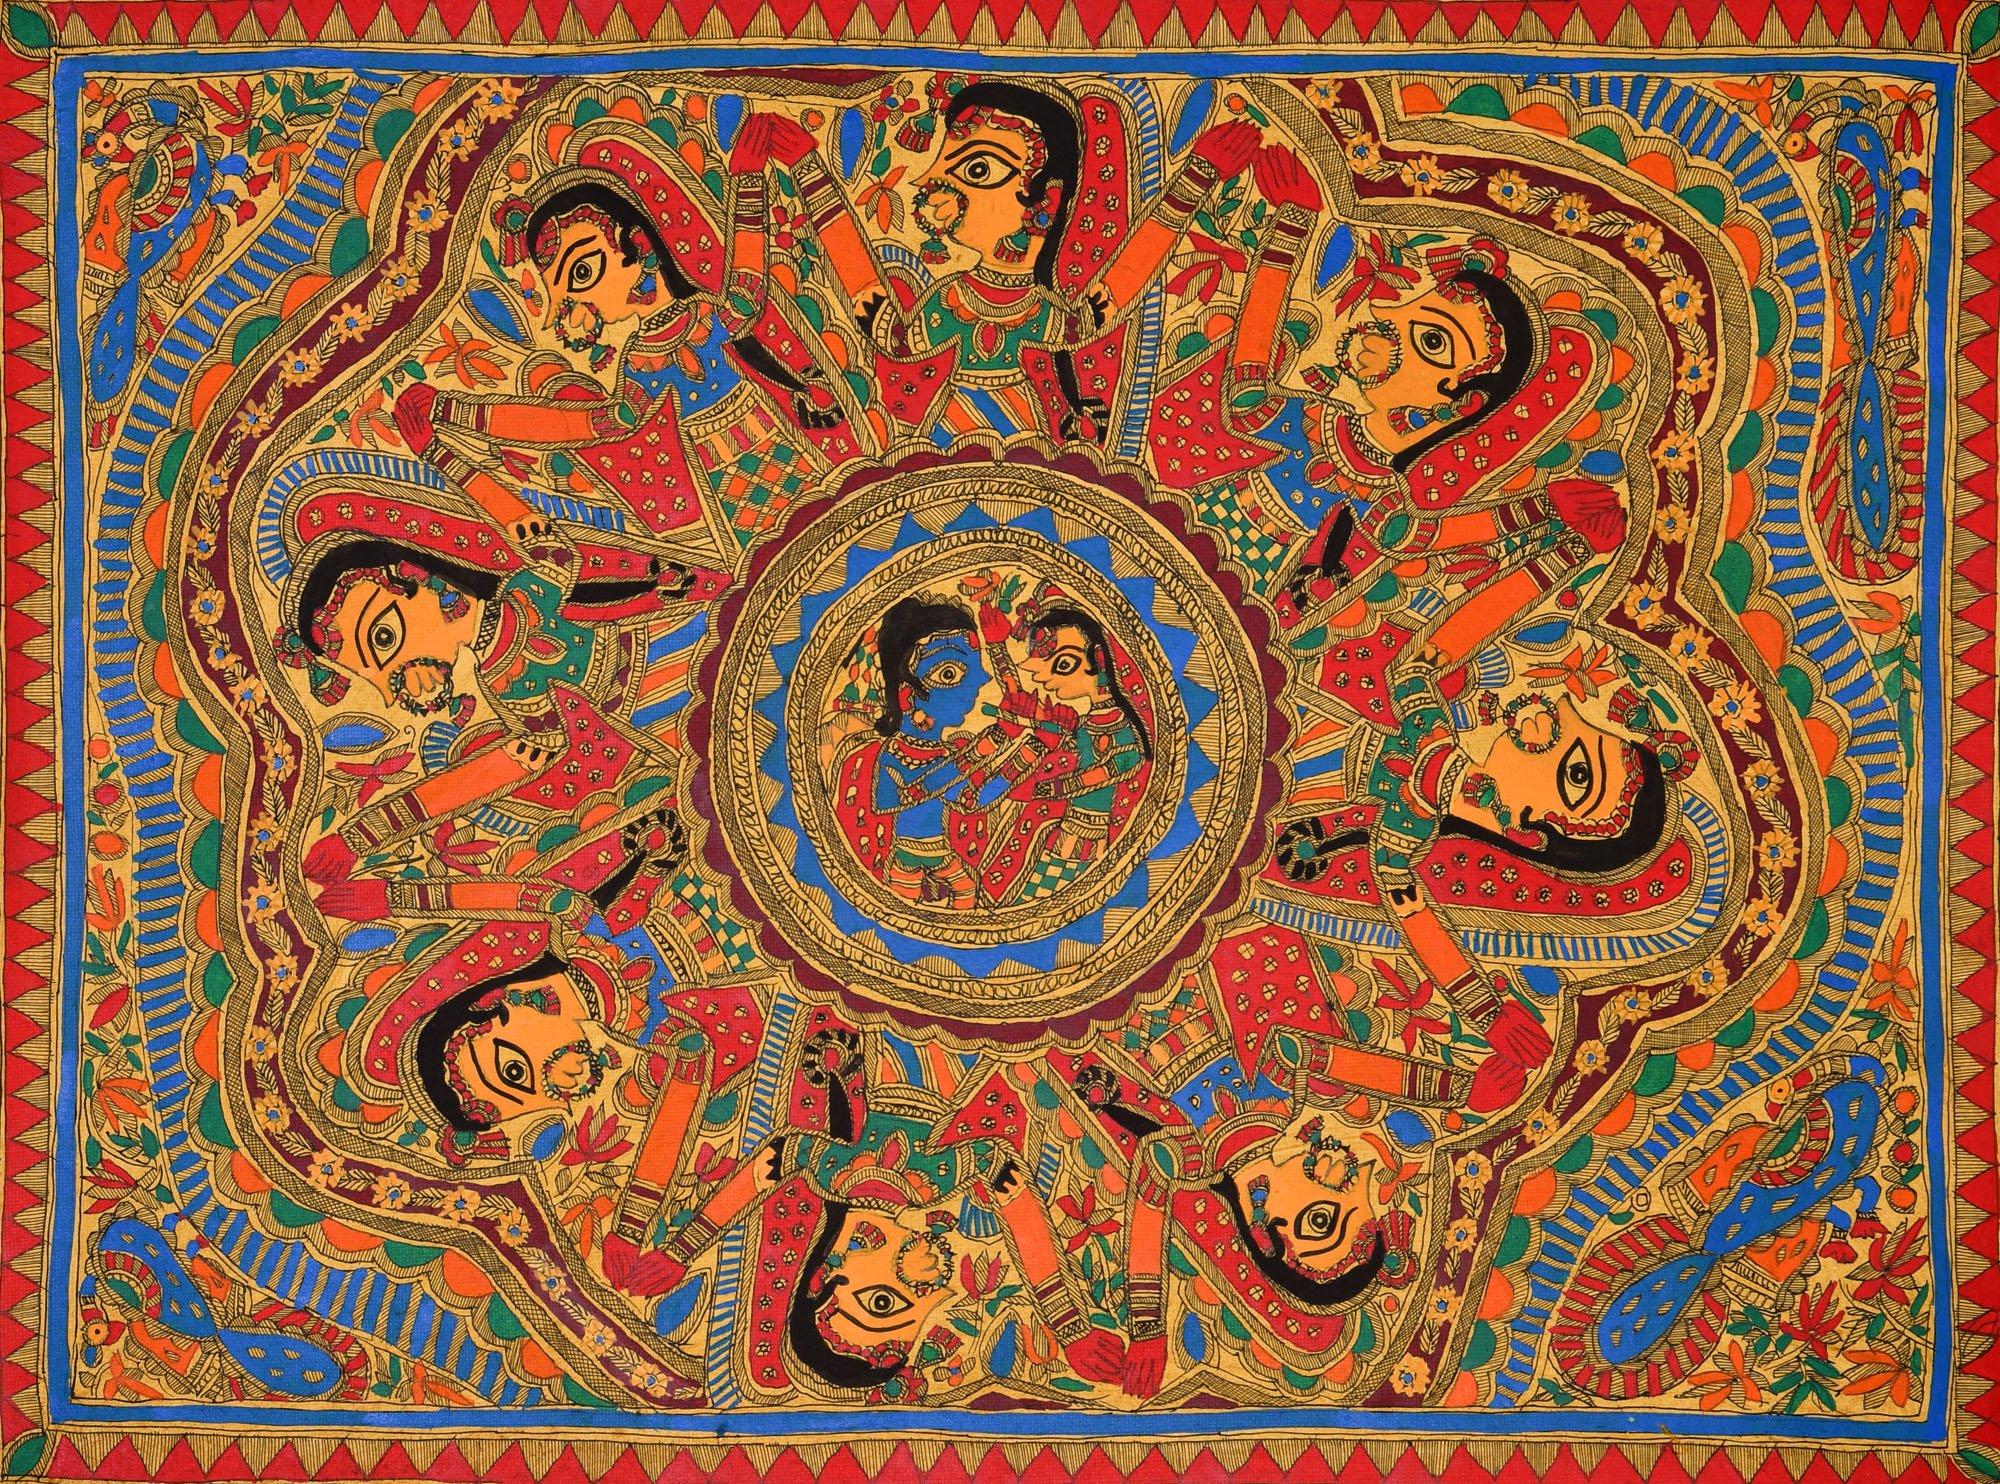 Rasa Leela - Madhubani Painting on Hand Made Paper treated with Cow Dung